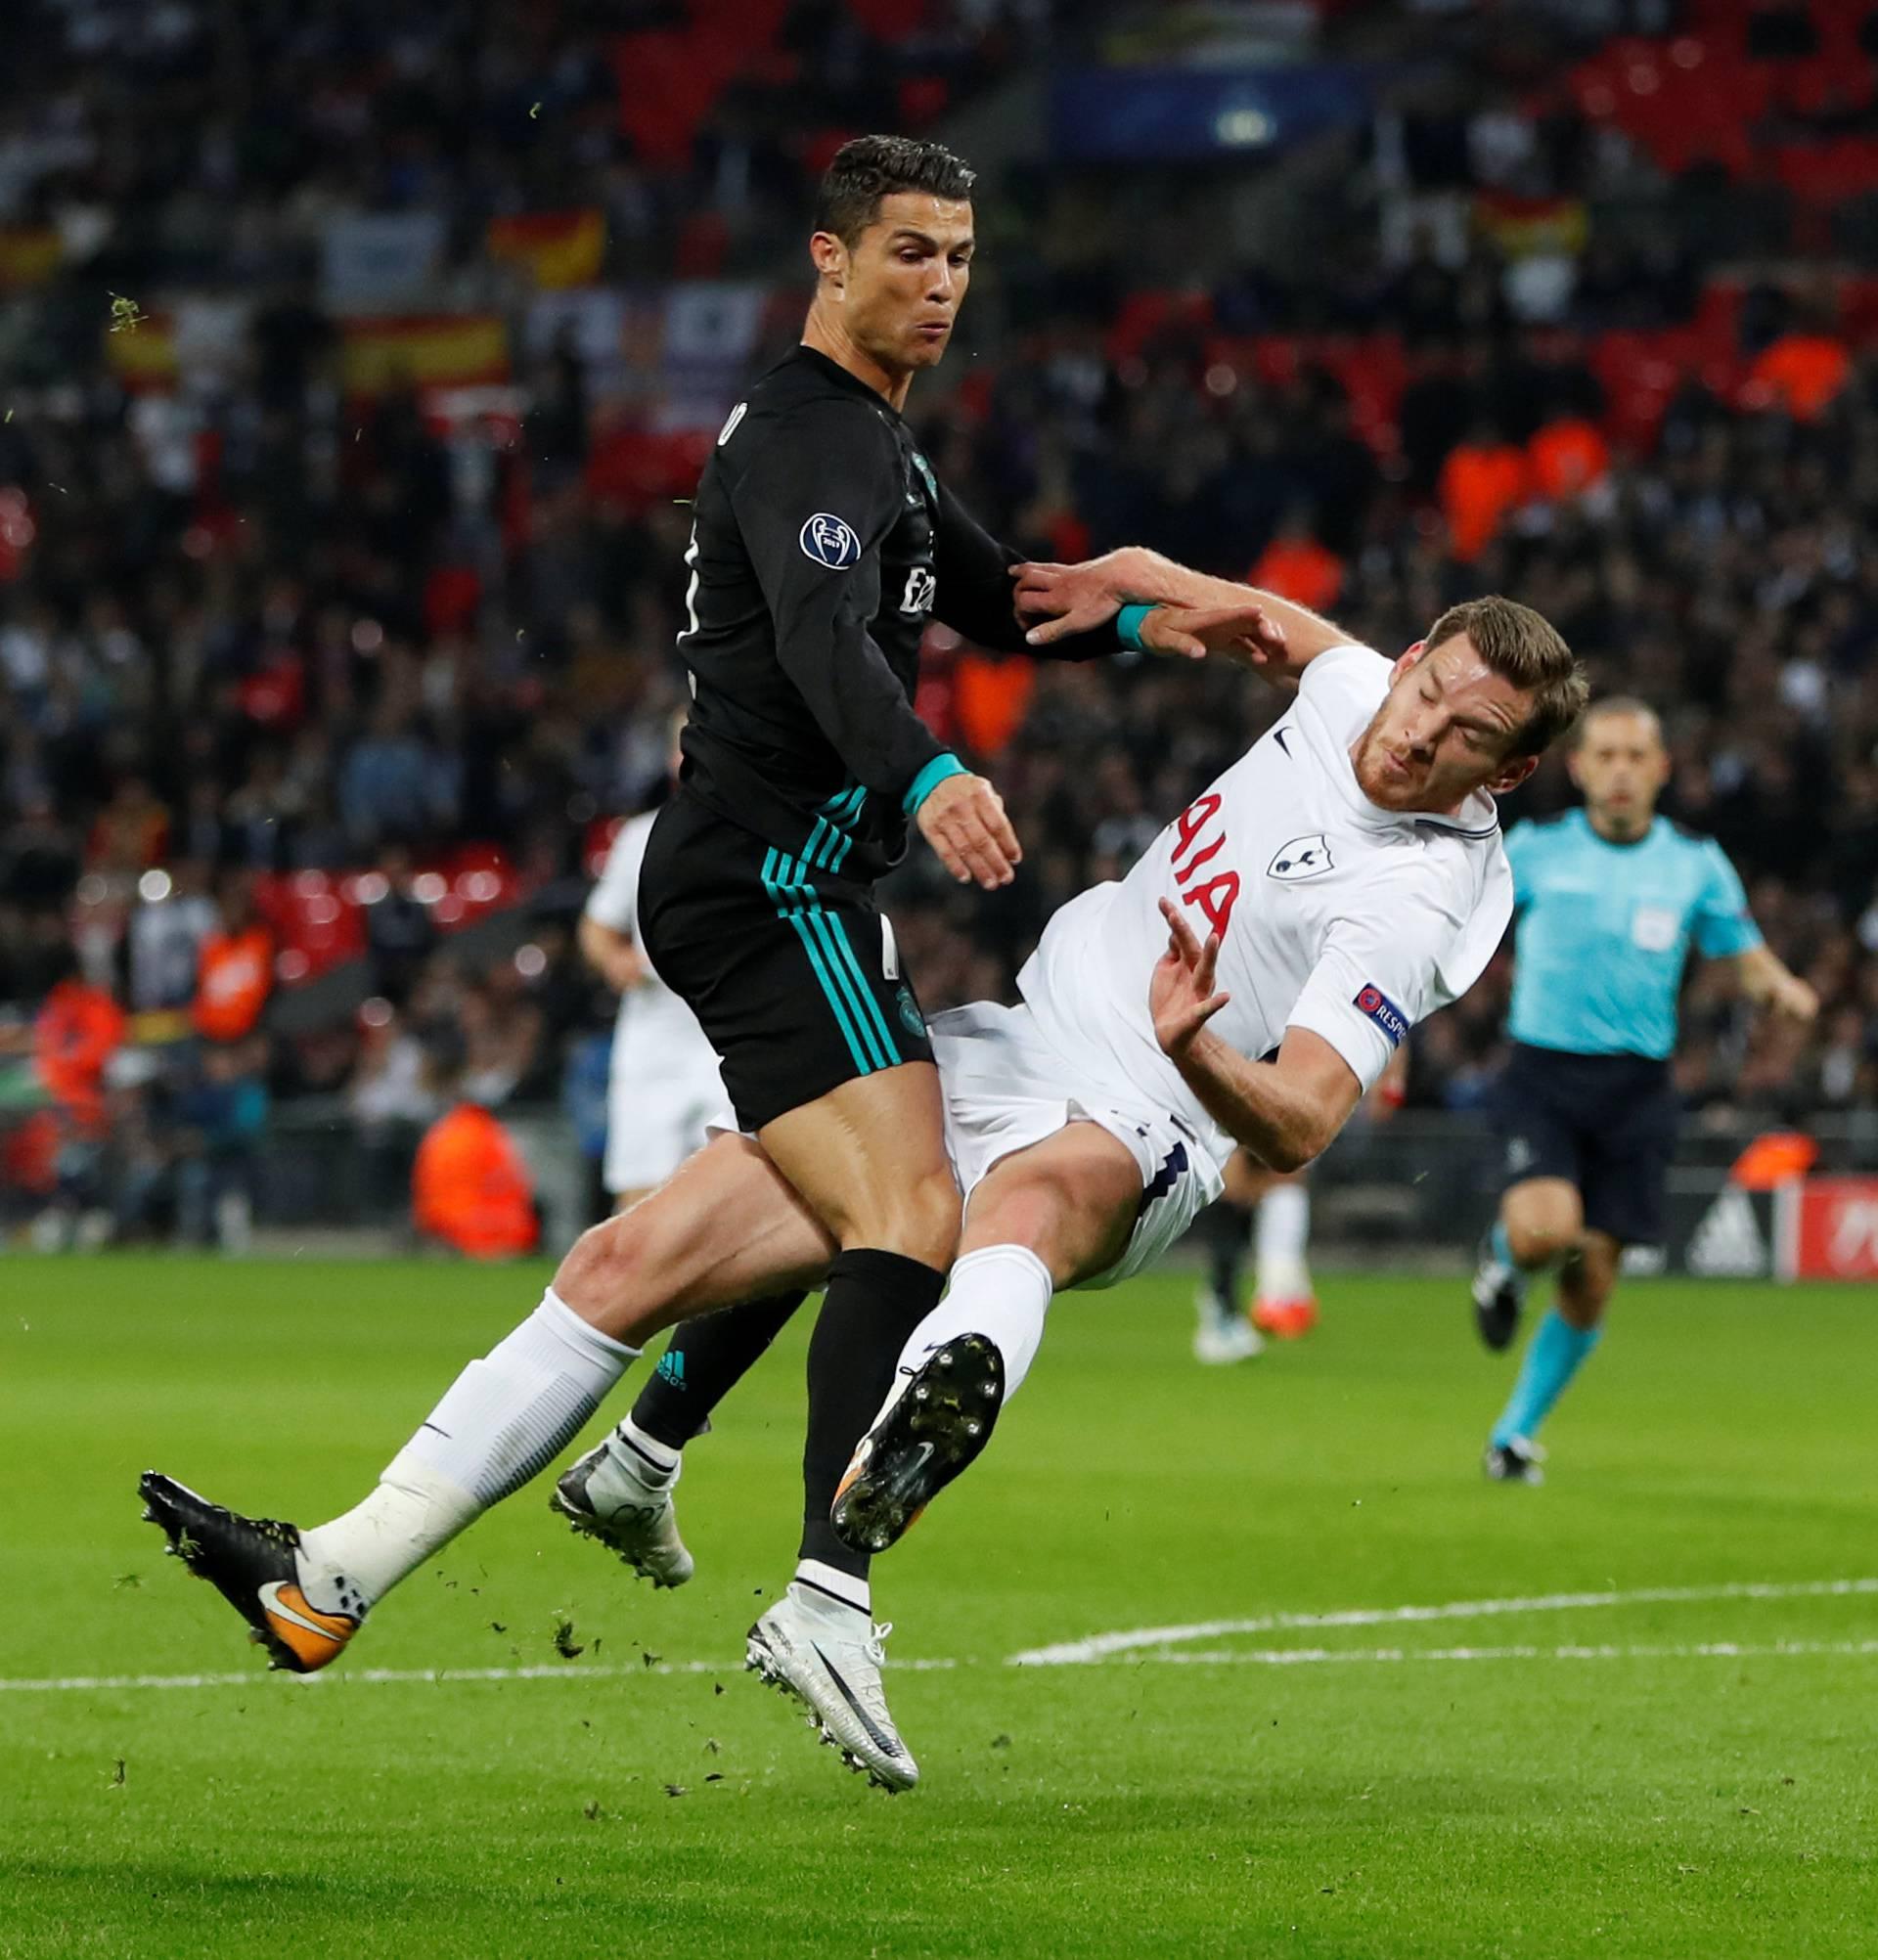 Champions League - Tottenham Hotspur vs Real Madrid